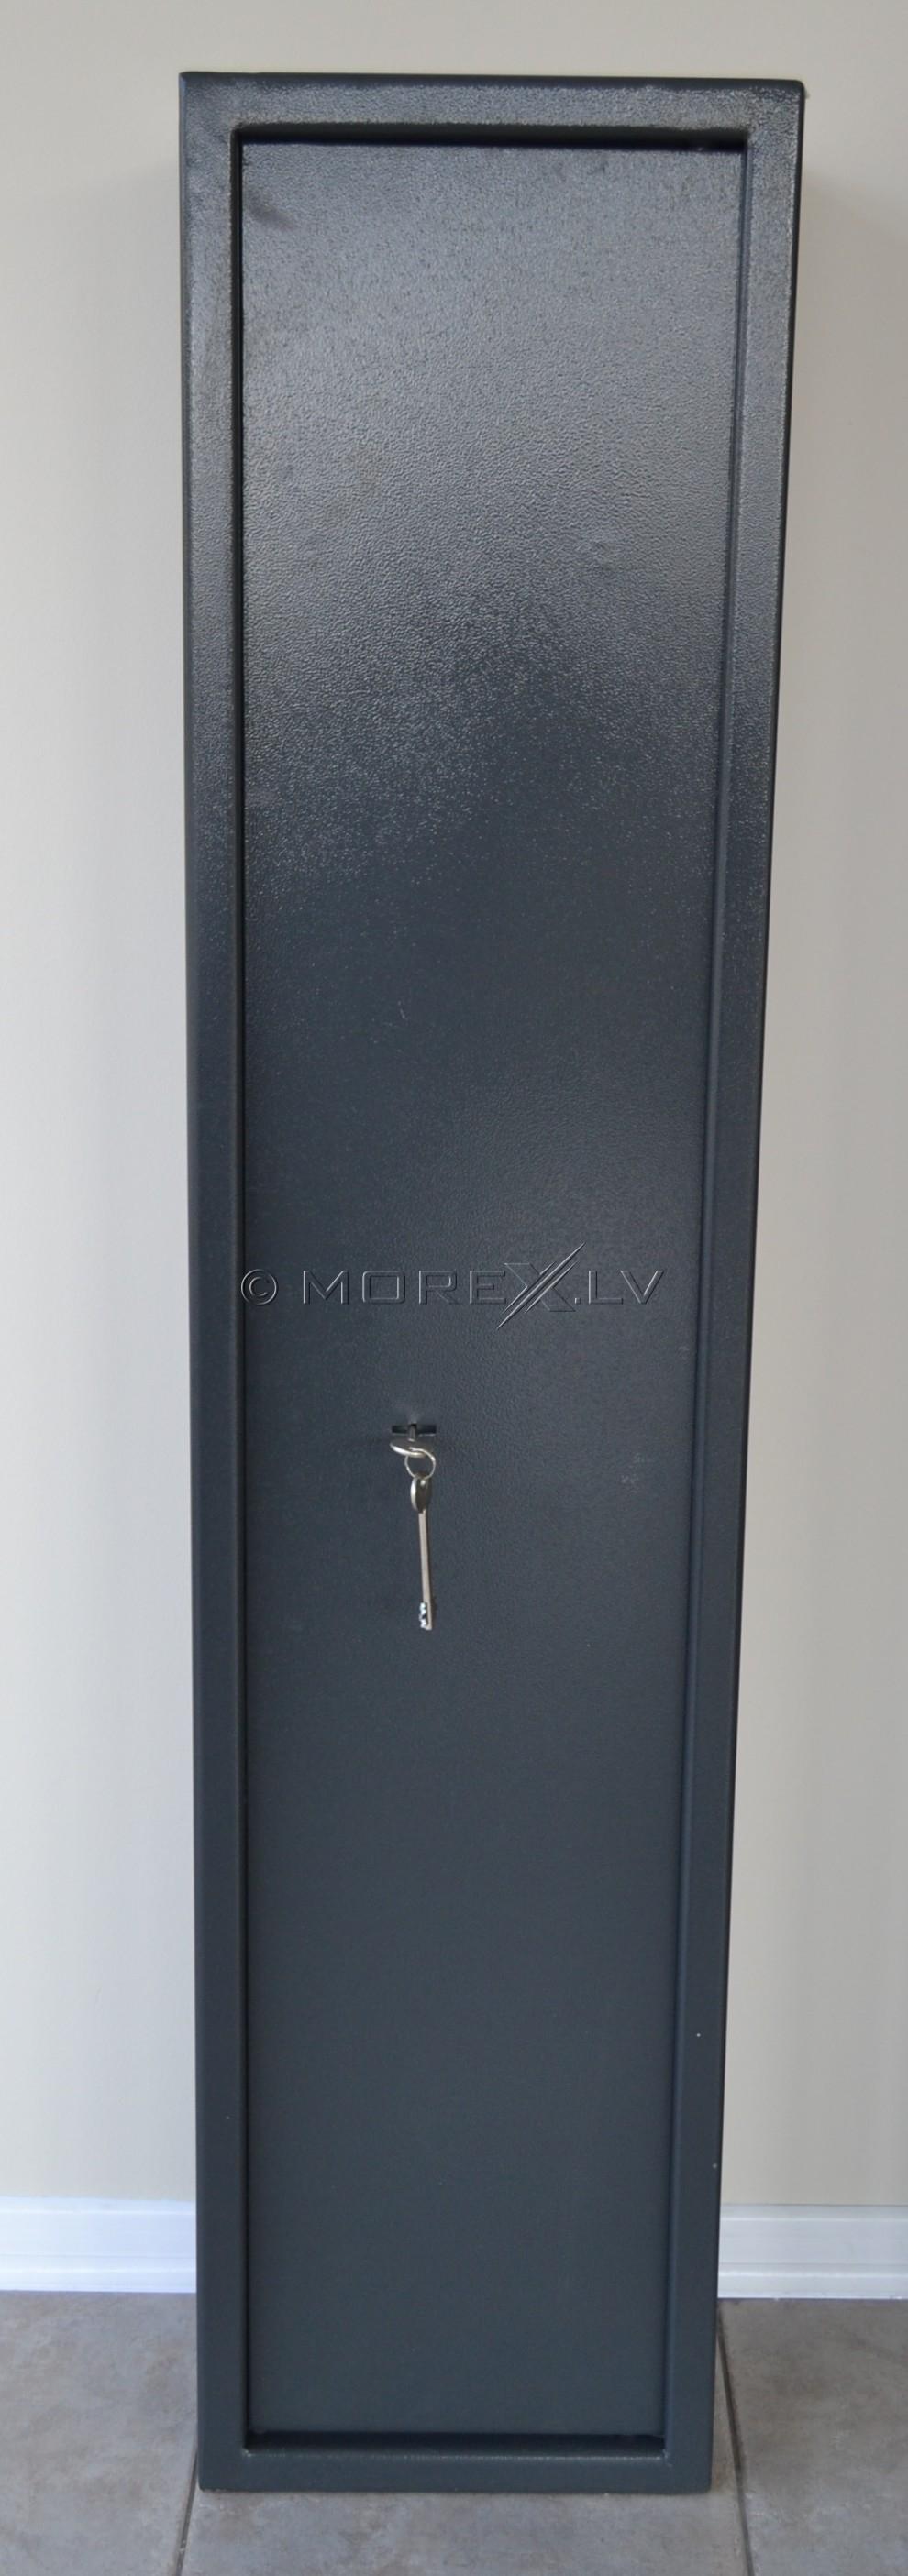 Ieroču seifs SG-138K3 (RC-1S) (3 ieročiem)